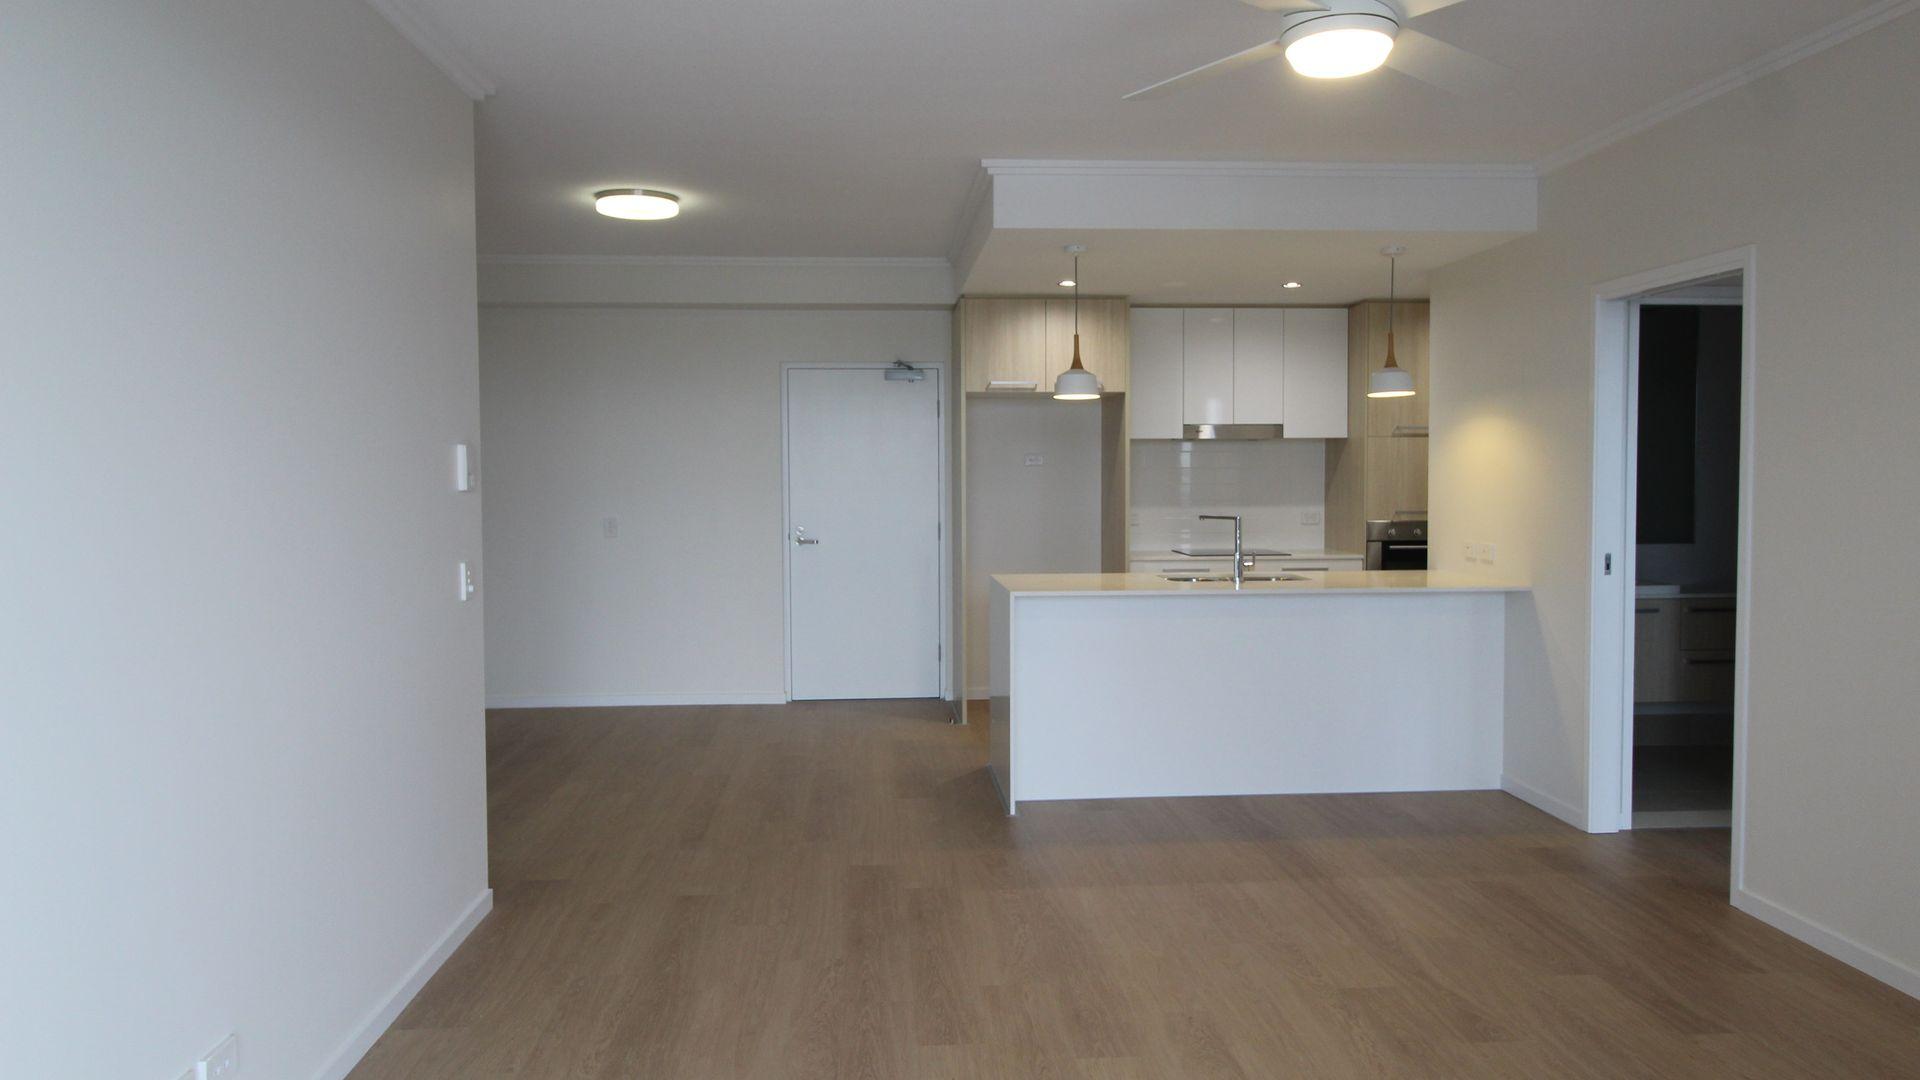 137/25 Parnell Blvd, Robina QLD 4226, Image 2